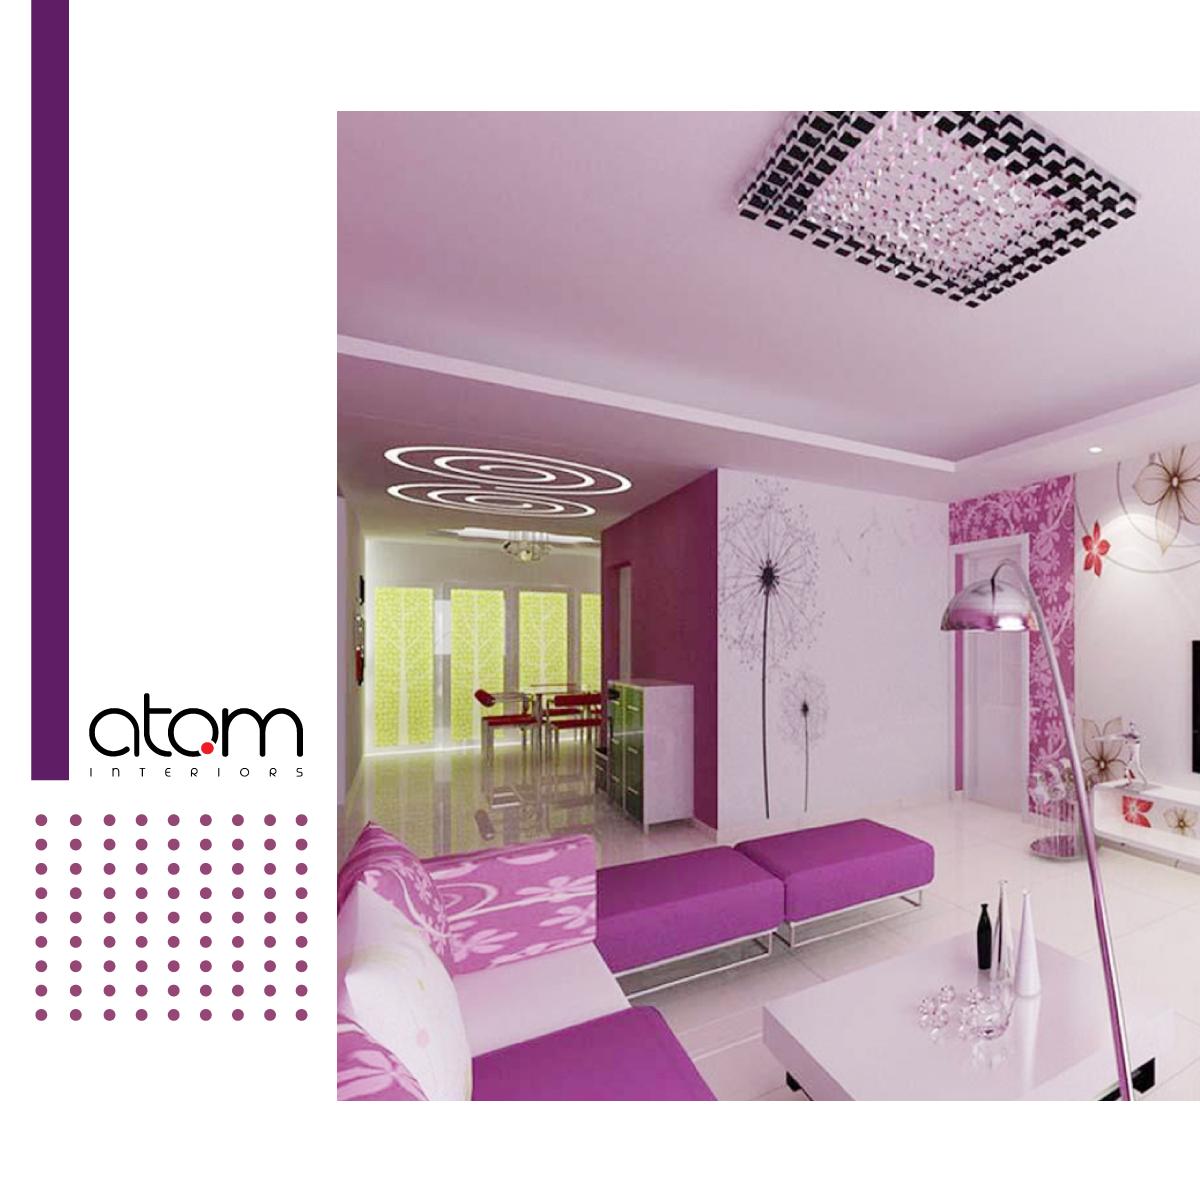 Home Design Ideas Bangalore: Pin By Atom Interiors, Bangalore On Home Interiors